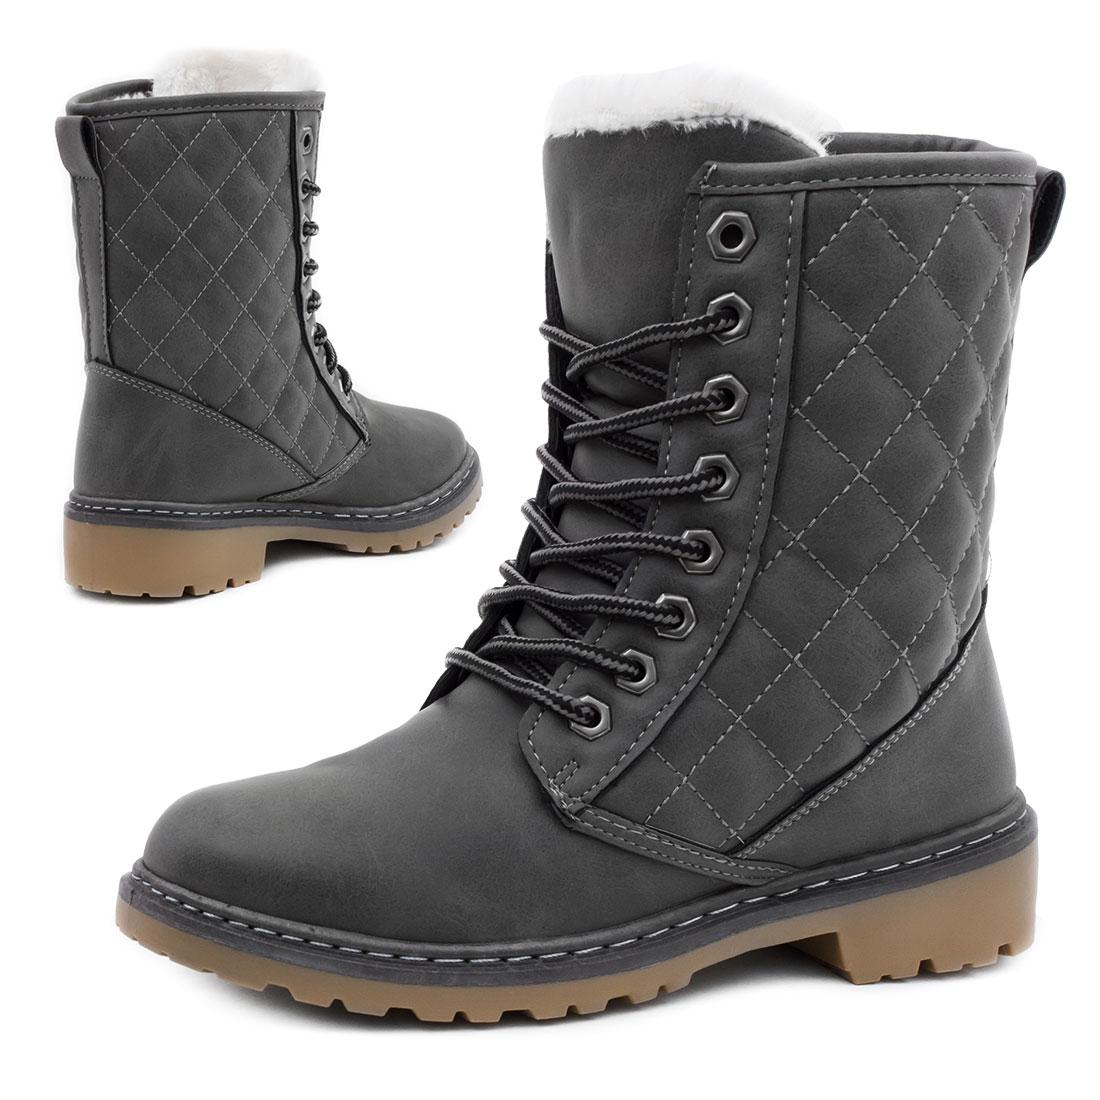 neu damen winter stiefel schn r stiefeletten boots in lederoptik schuhe ebay. Black Bedroom Furniture Sets. Home Design Ideas